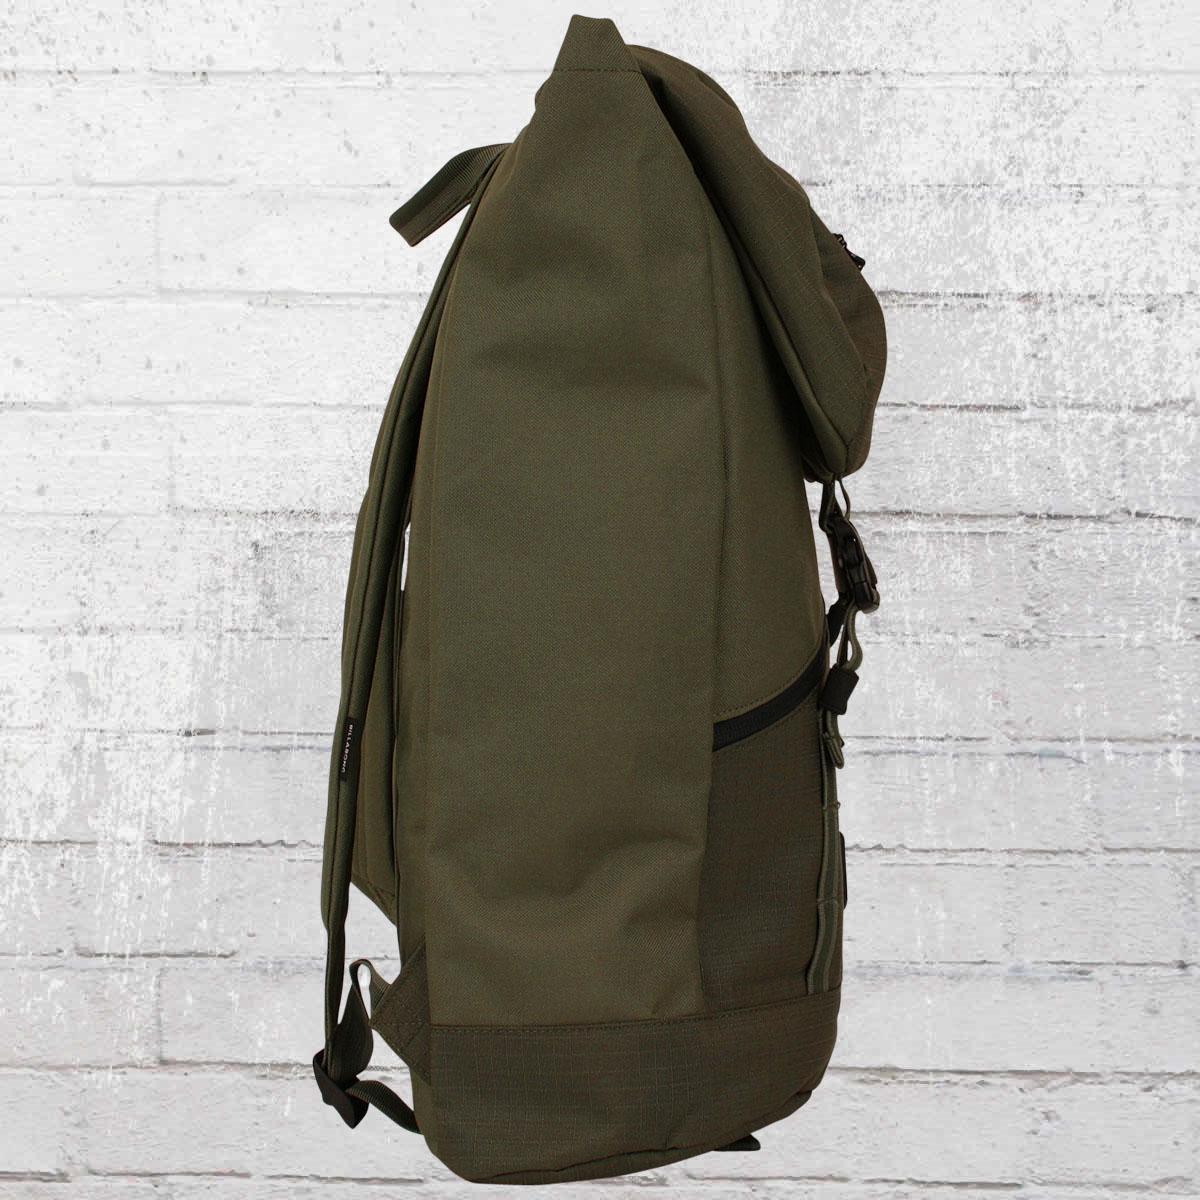 jetzt bestellen billabong trekking rucksack track pack. Black Bedroom Furniture Sets. Home Design Ideas